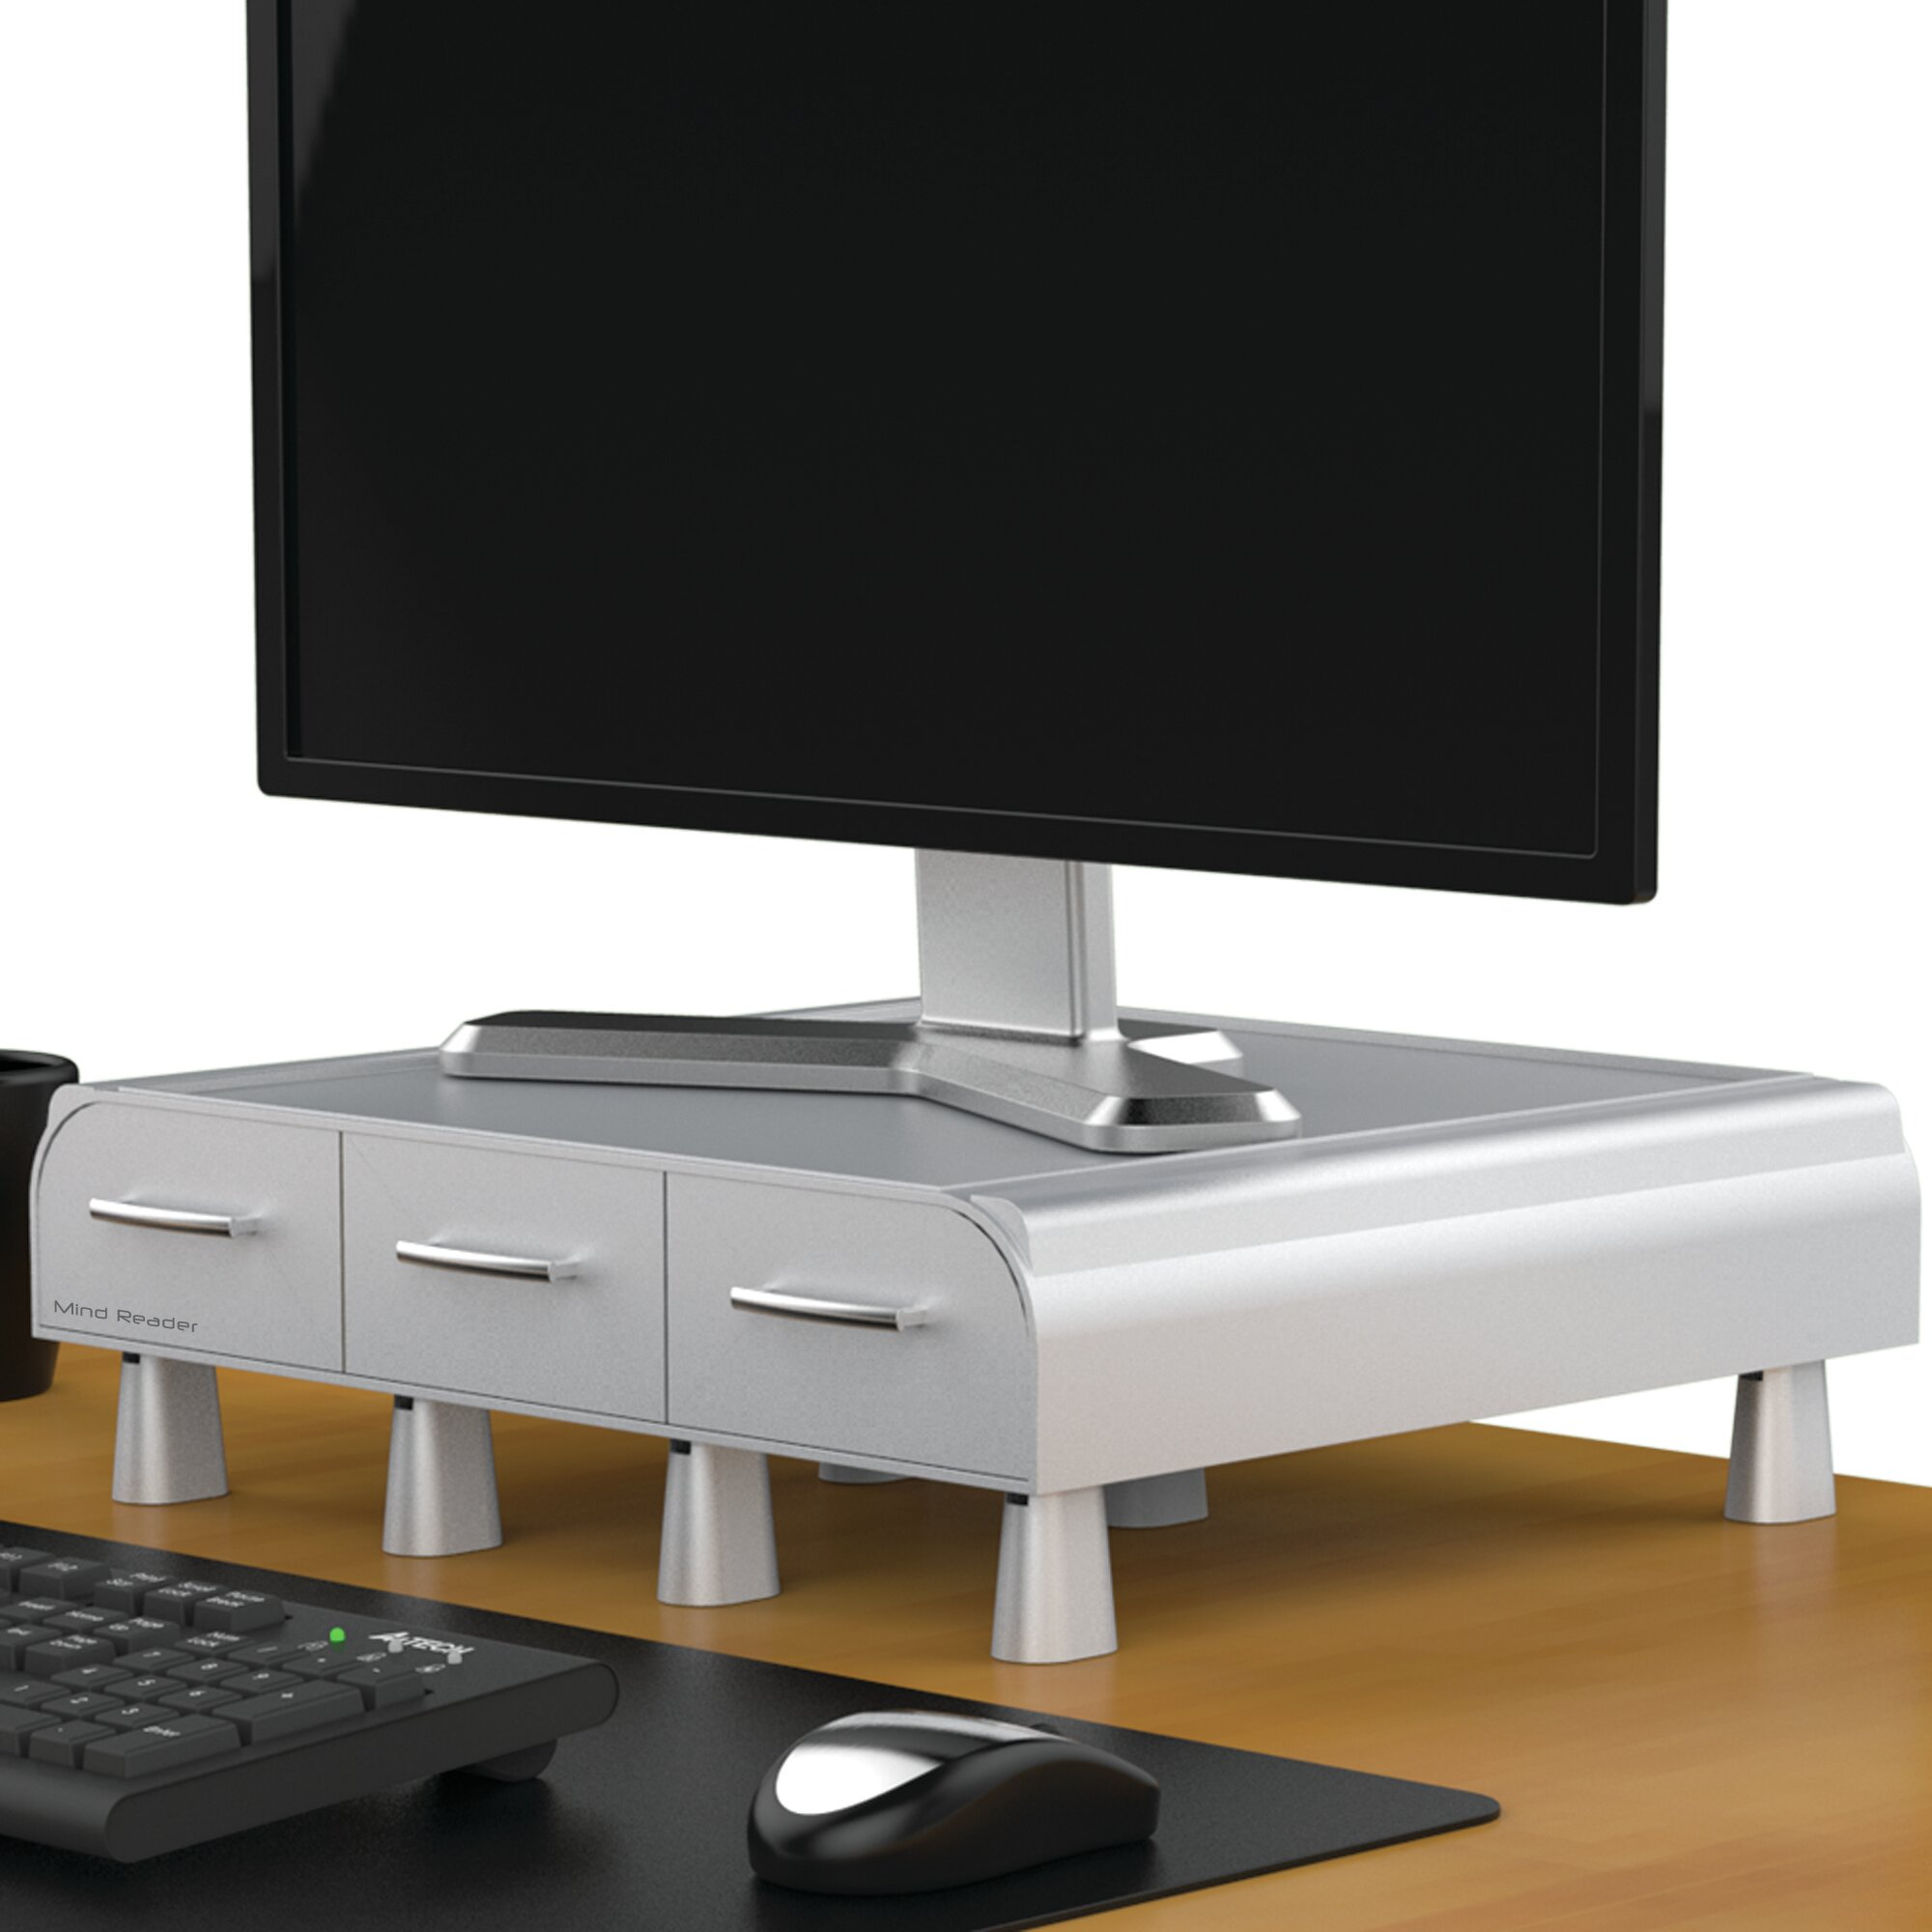 premier audio monitor mic mounts store mount usb for audiomicusb stand desktop with series dual ports desk loctek